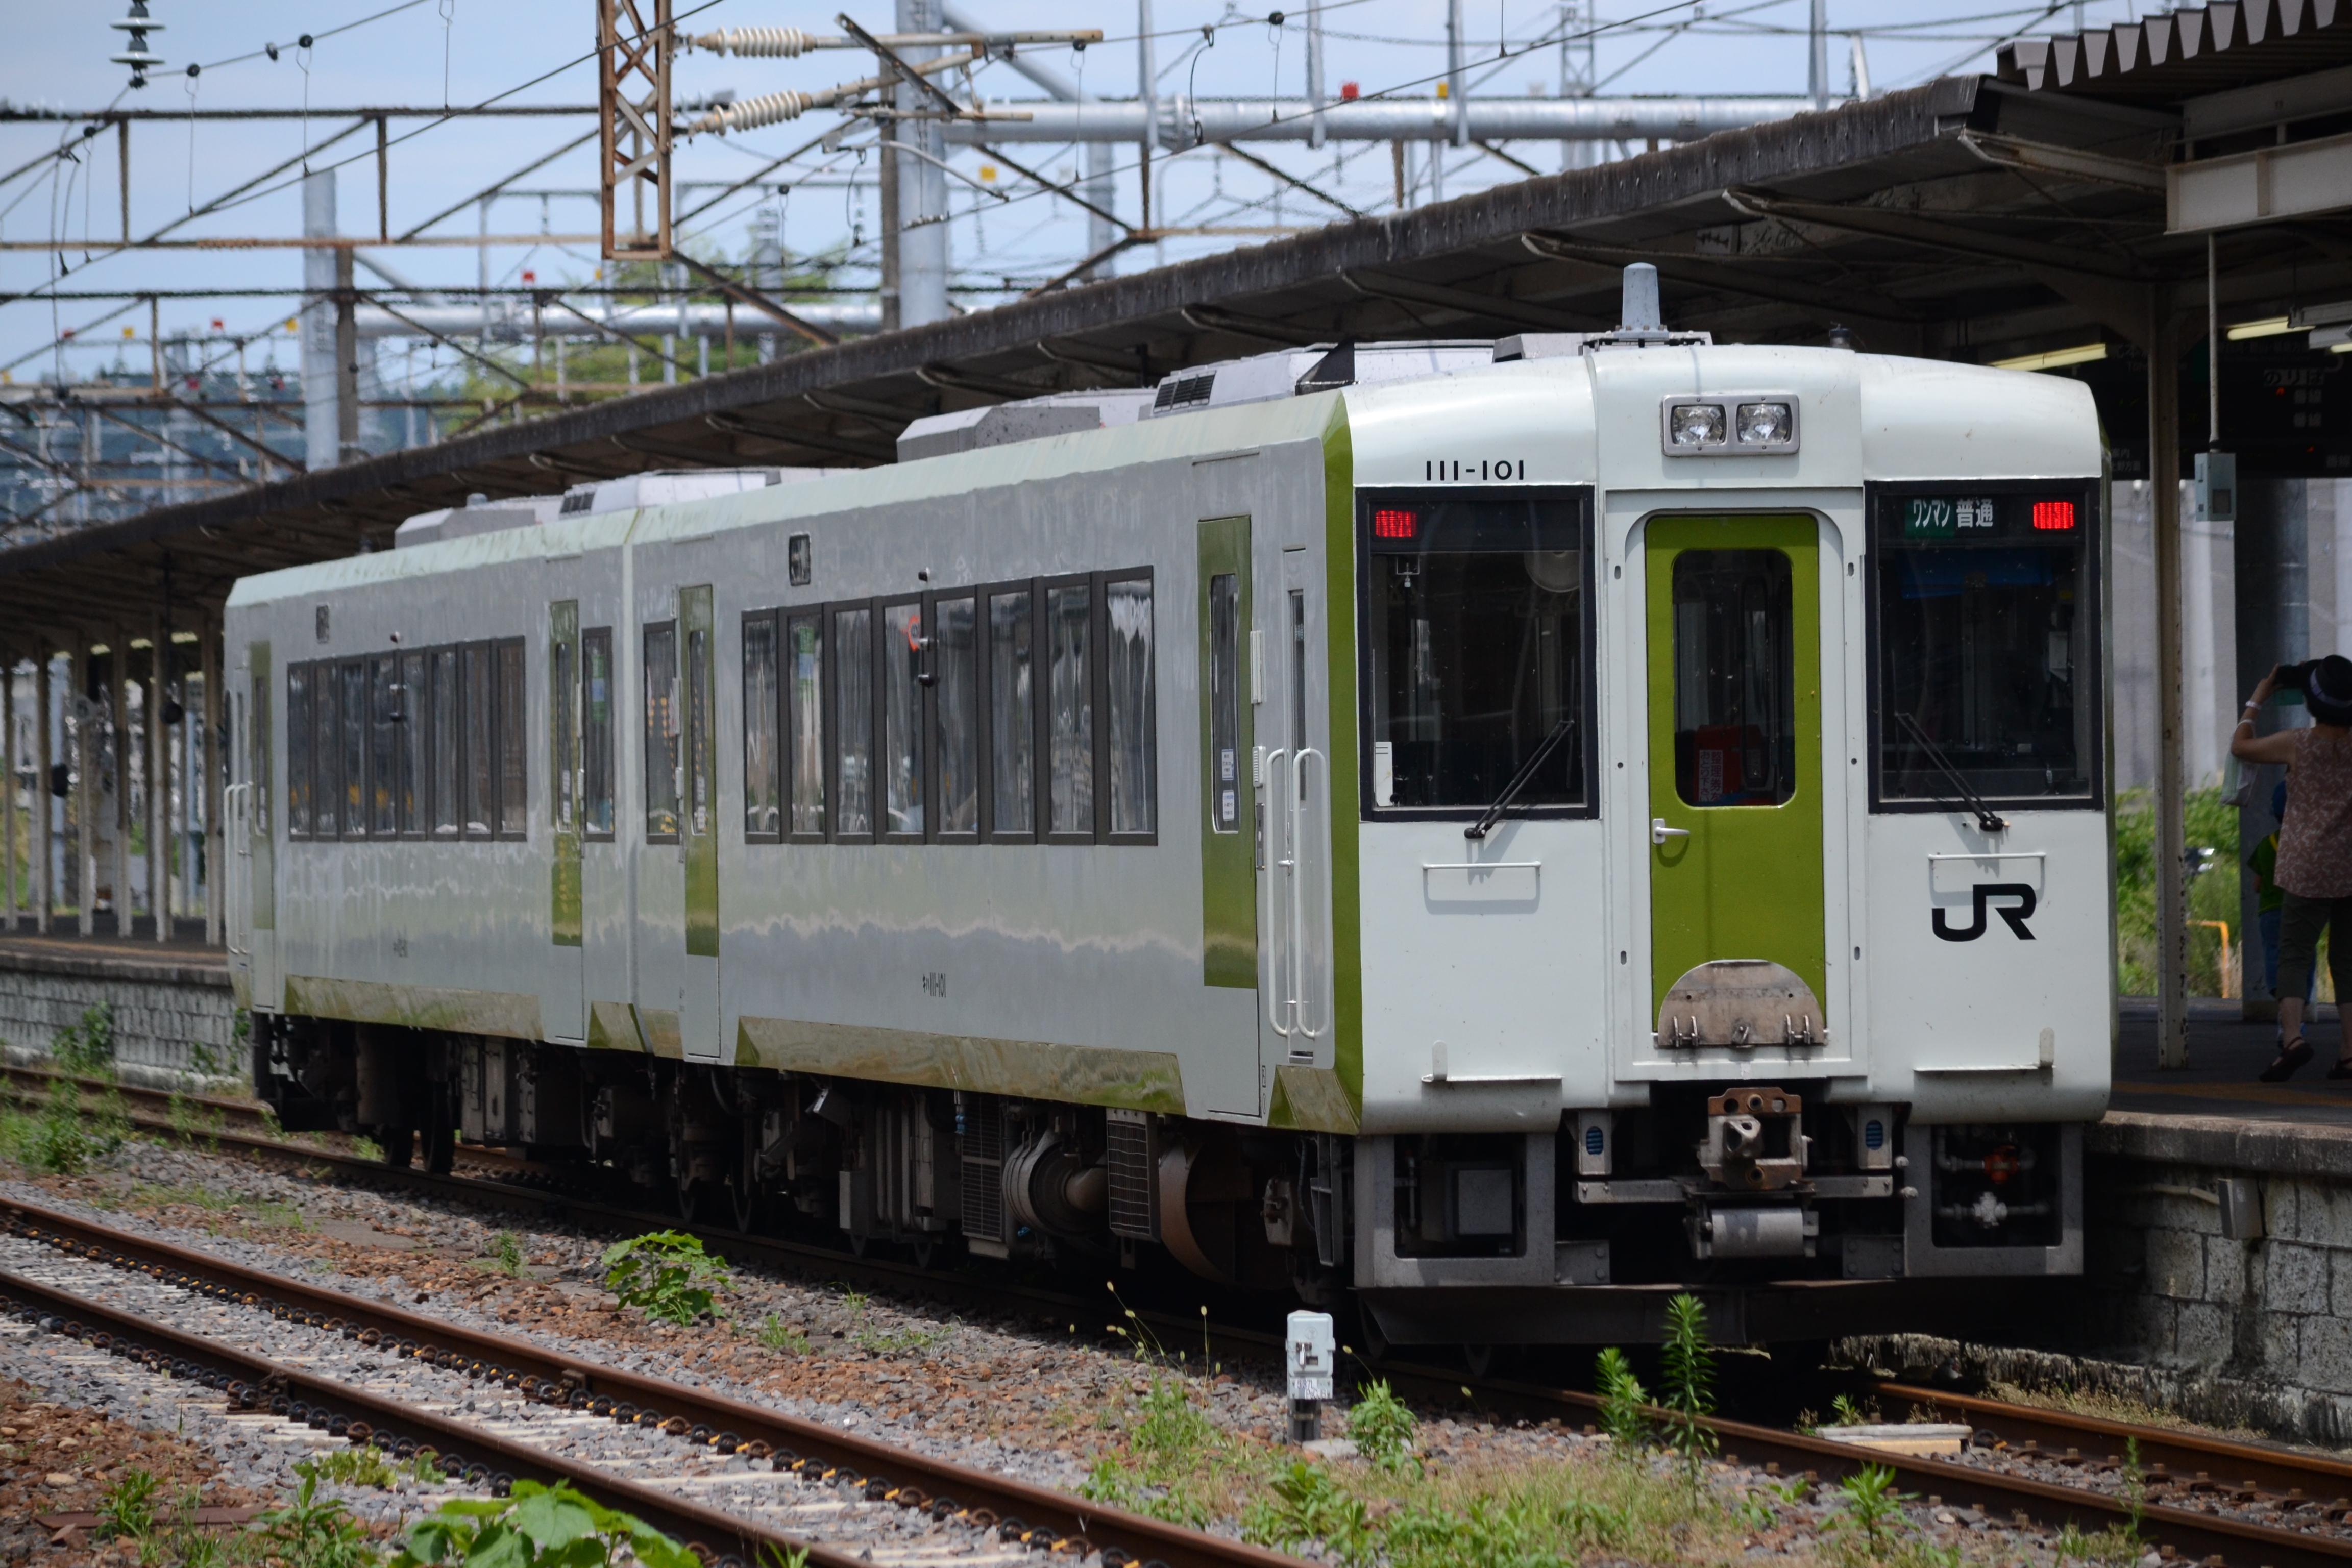 https://upload.wikimedia.org/wikipedia/commons/6/64/Kuroiso_station_kiha_110.jpg